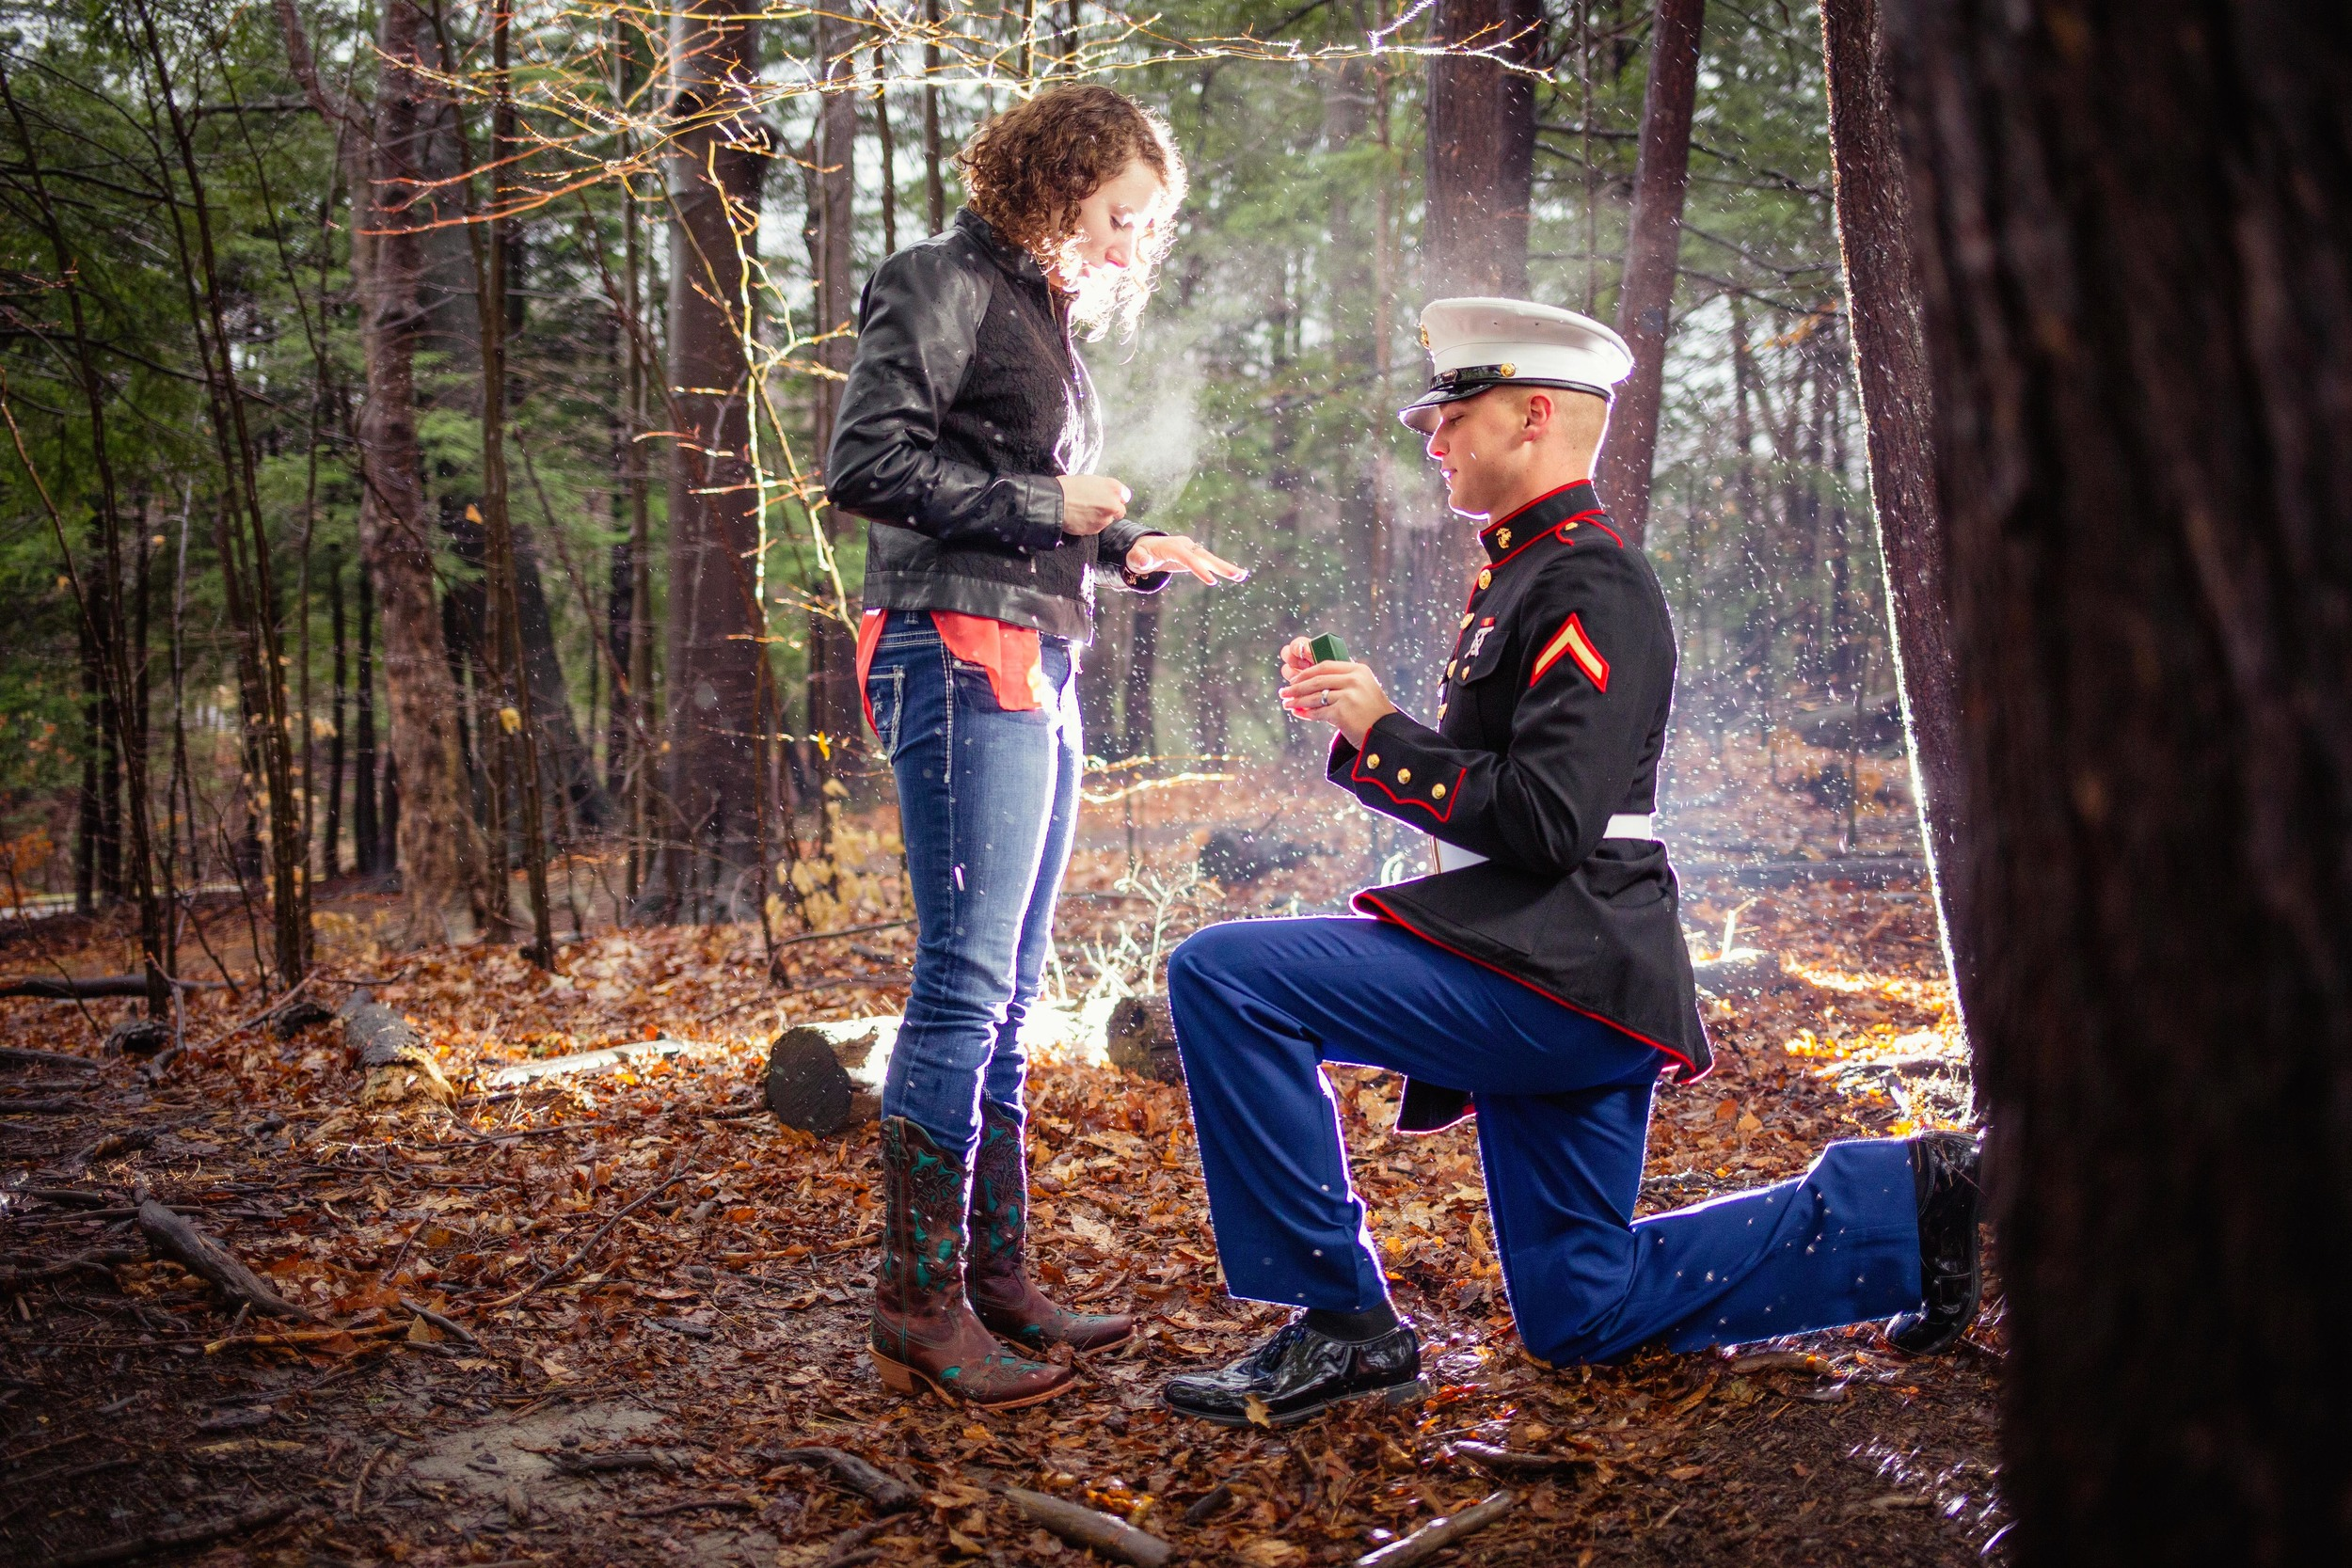 Megan-Brandon-Engagement-Stefan-Ludwig-Photography-Buffalo-NY-Chestnut-Ridge-Park-41-x.jpg